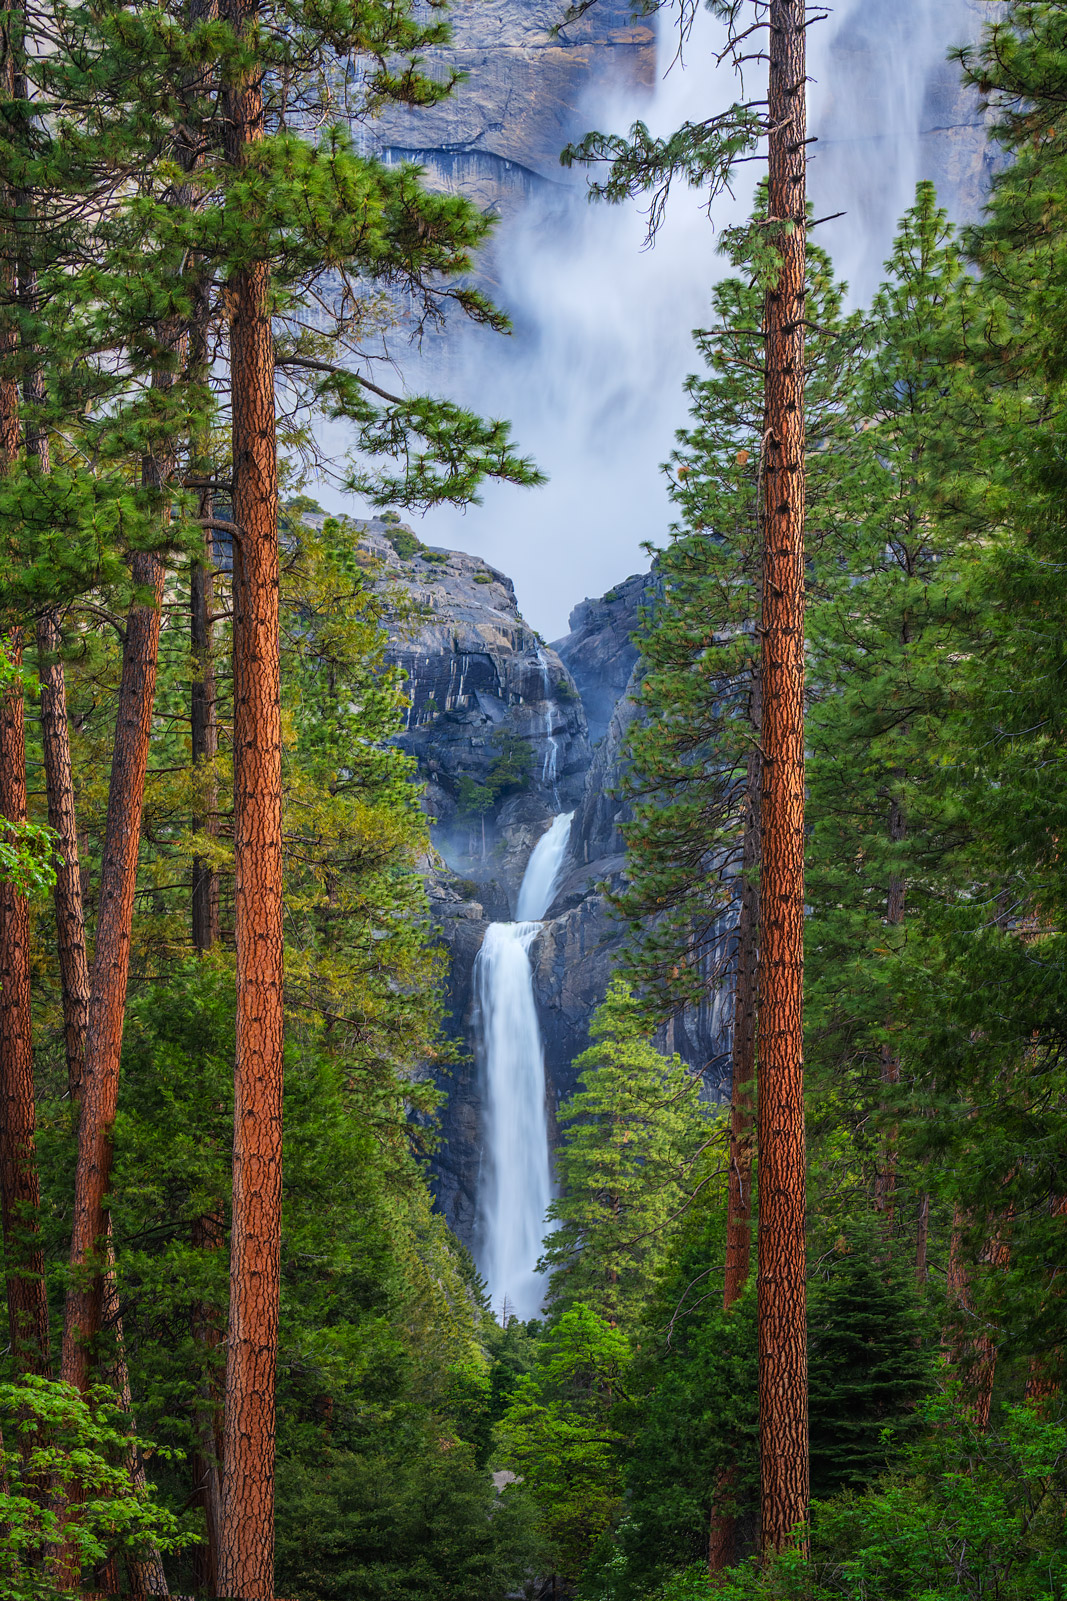 A Limited Edition, Fine Art photograph looking at Yosemite Falls through two tall Ponderosa Pine Trees at Yosemite National Park...